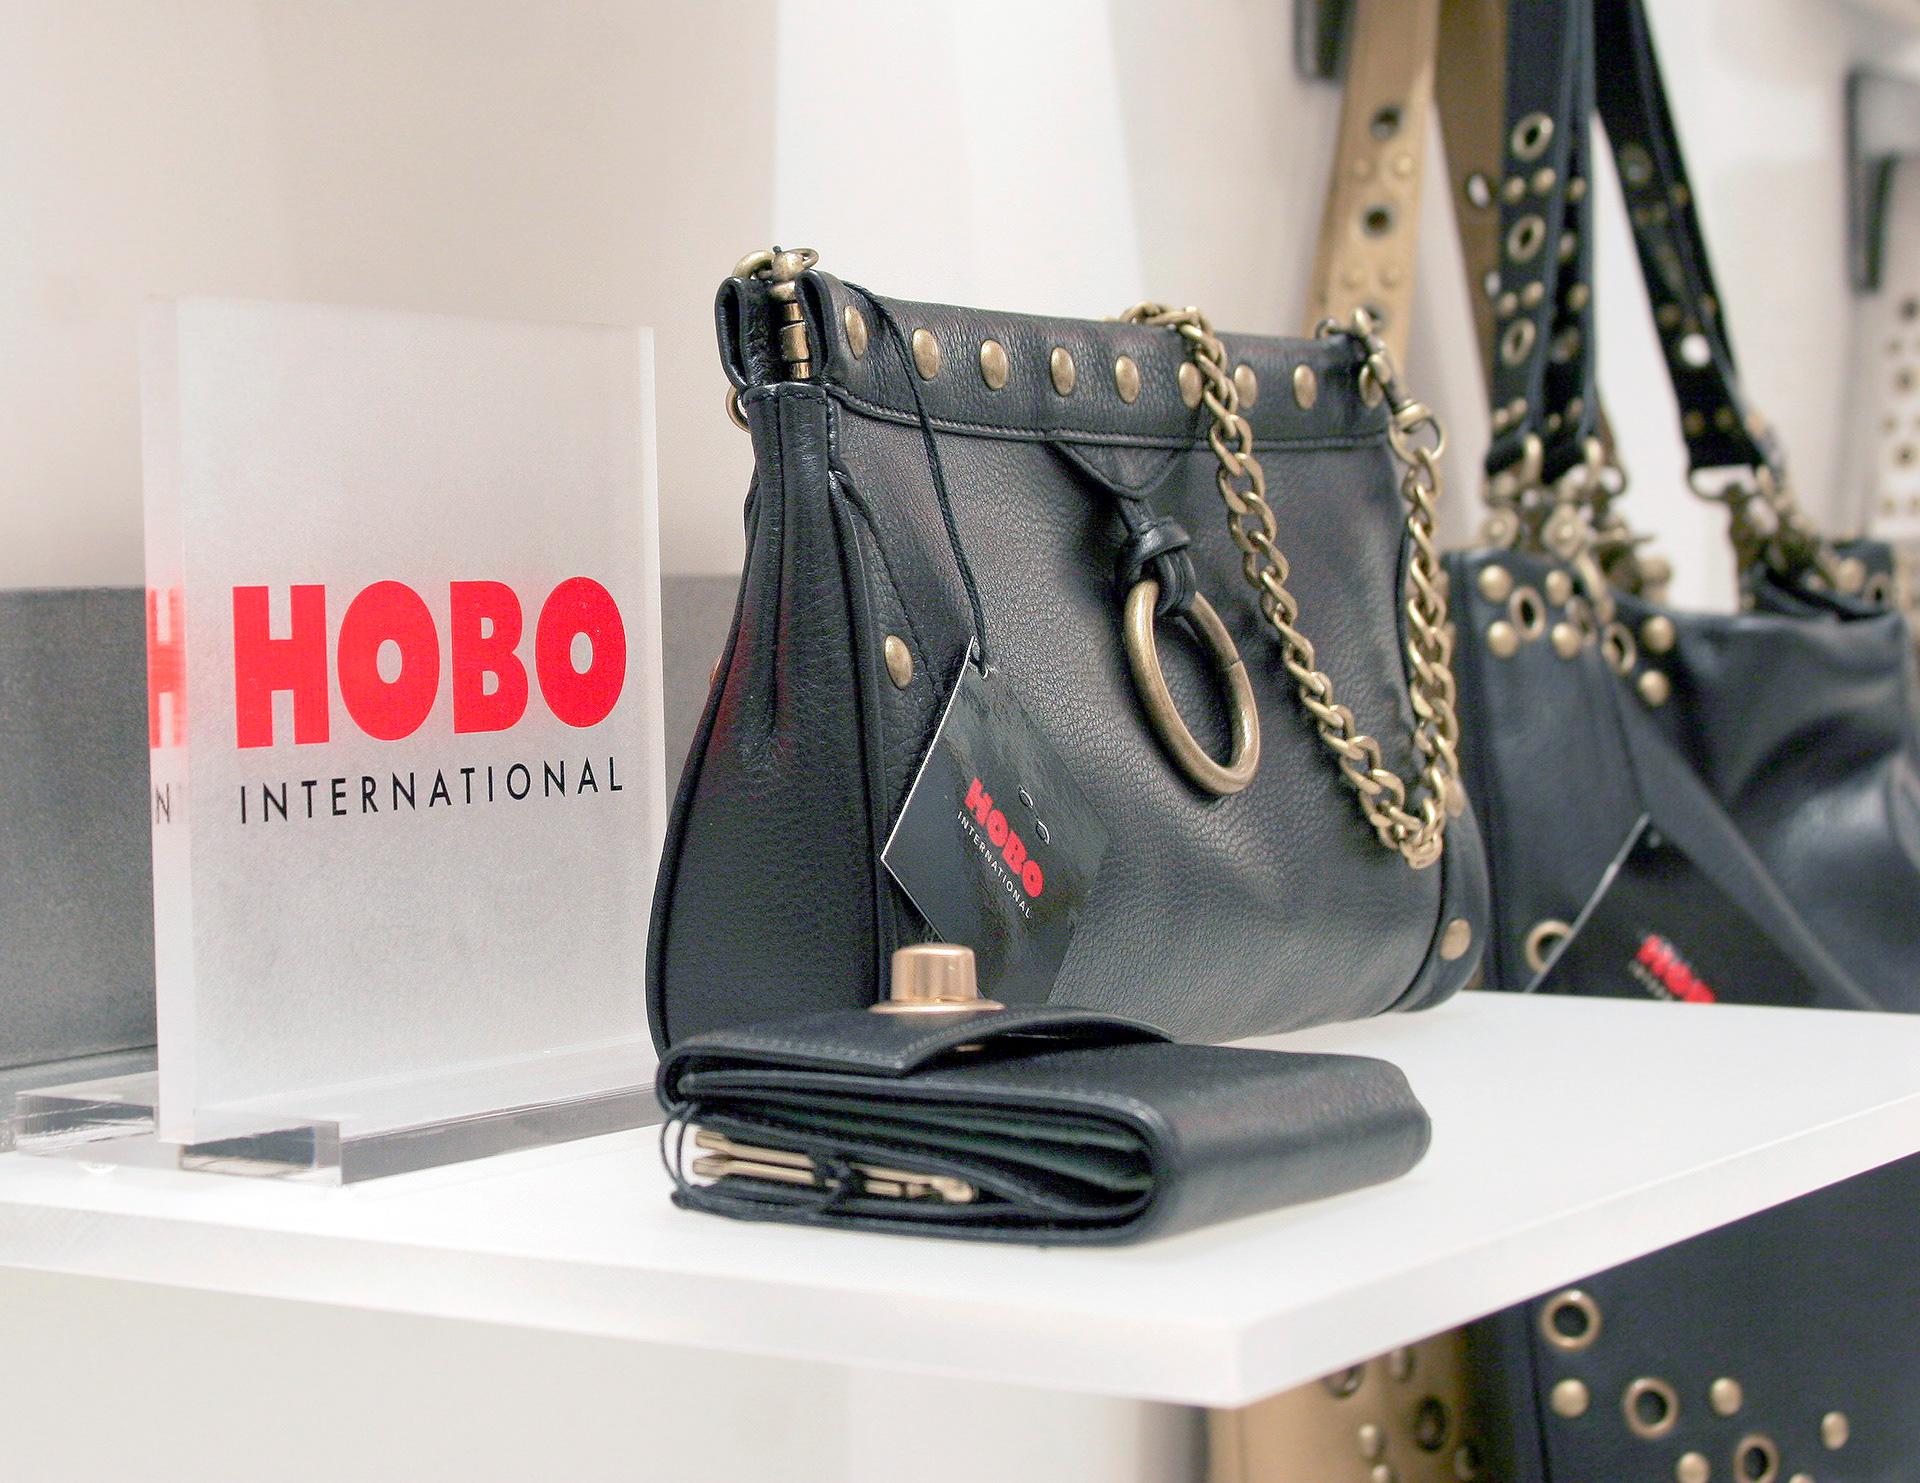 c4368733be77 HOBO BAGS International Showroom Design. When handbag company Hobo  International